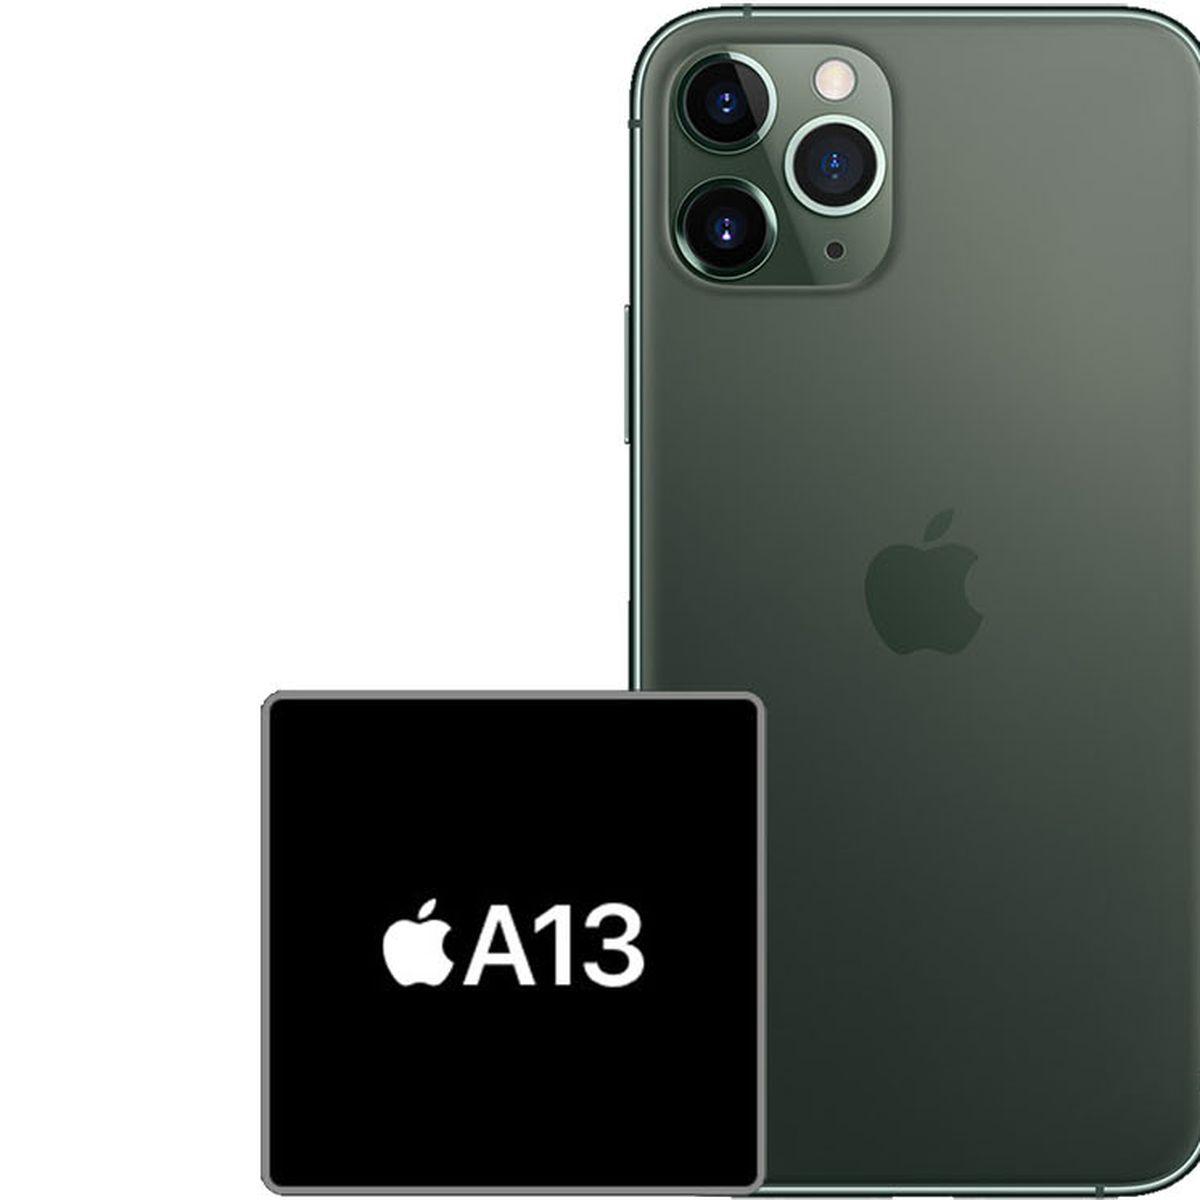 Apple Says A13 Bionic Chip Was Designed With Performance Per Watt Focus Macrumors